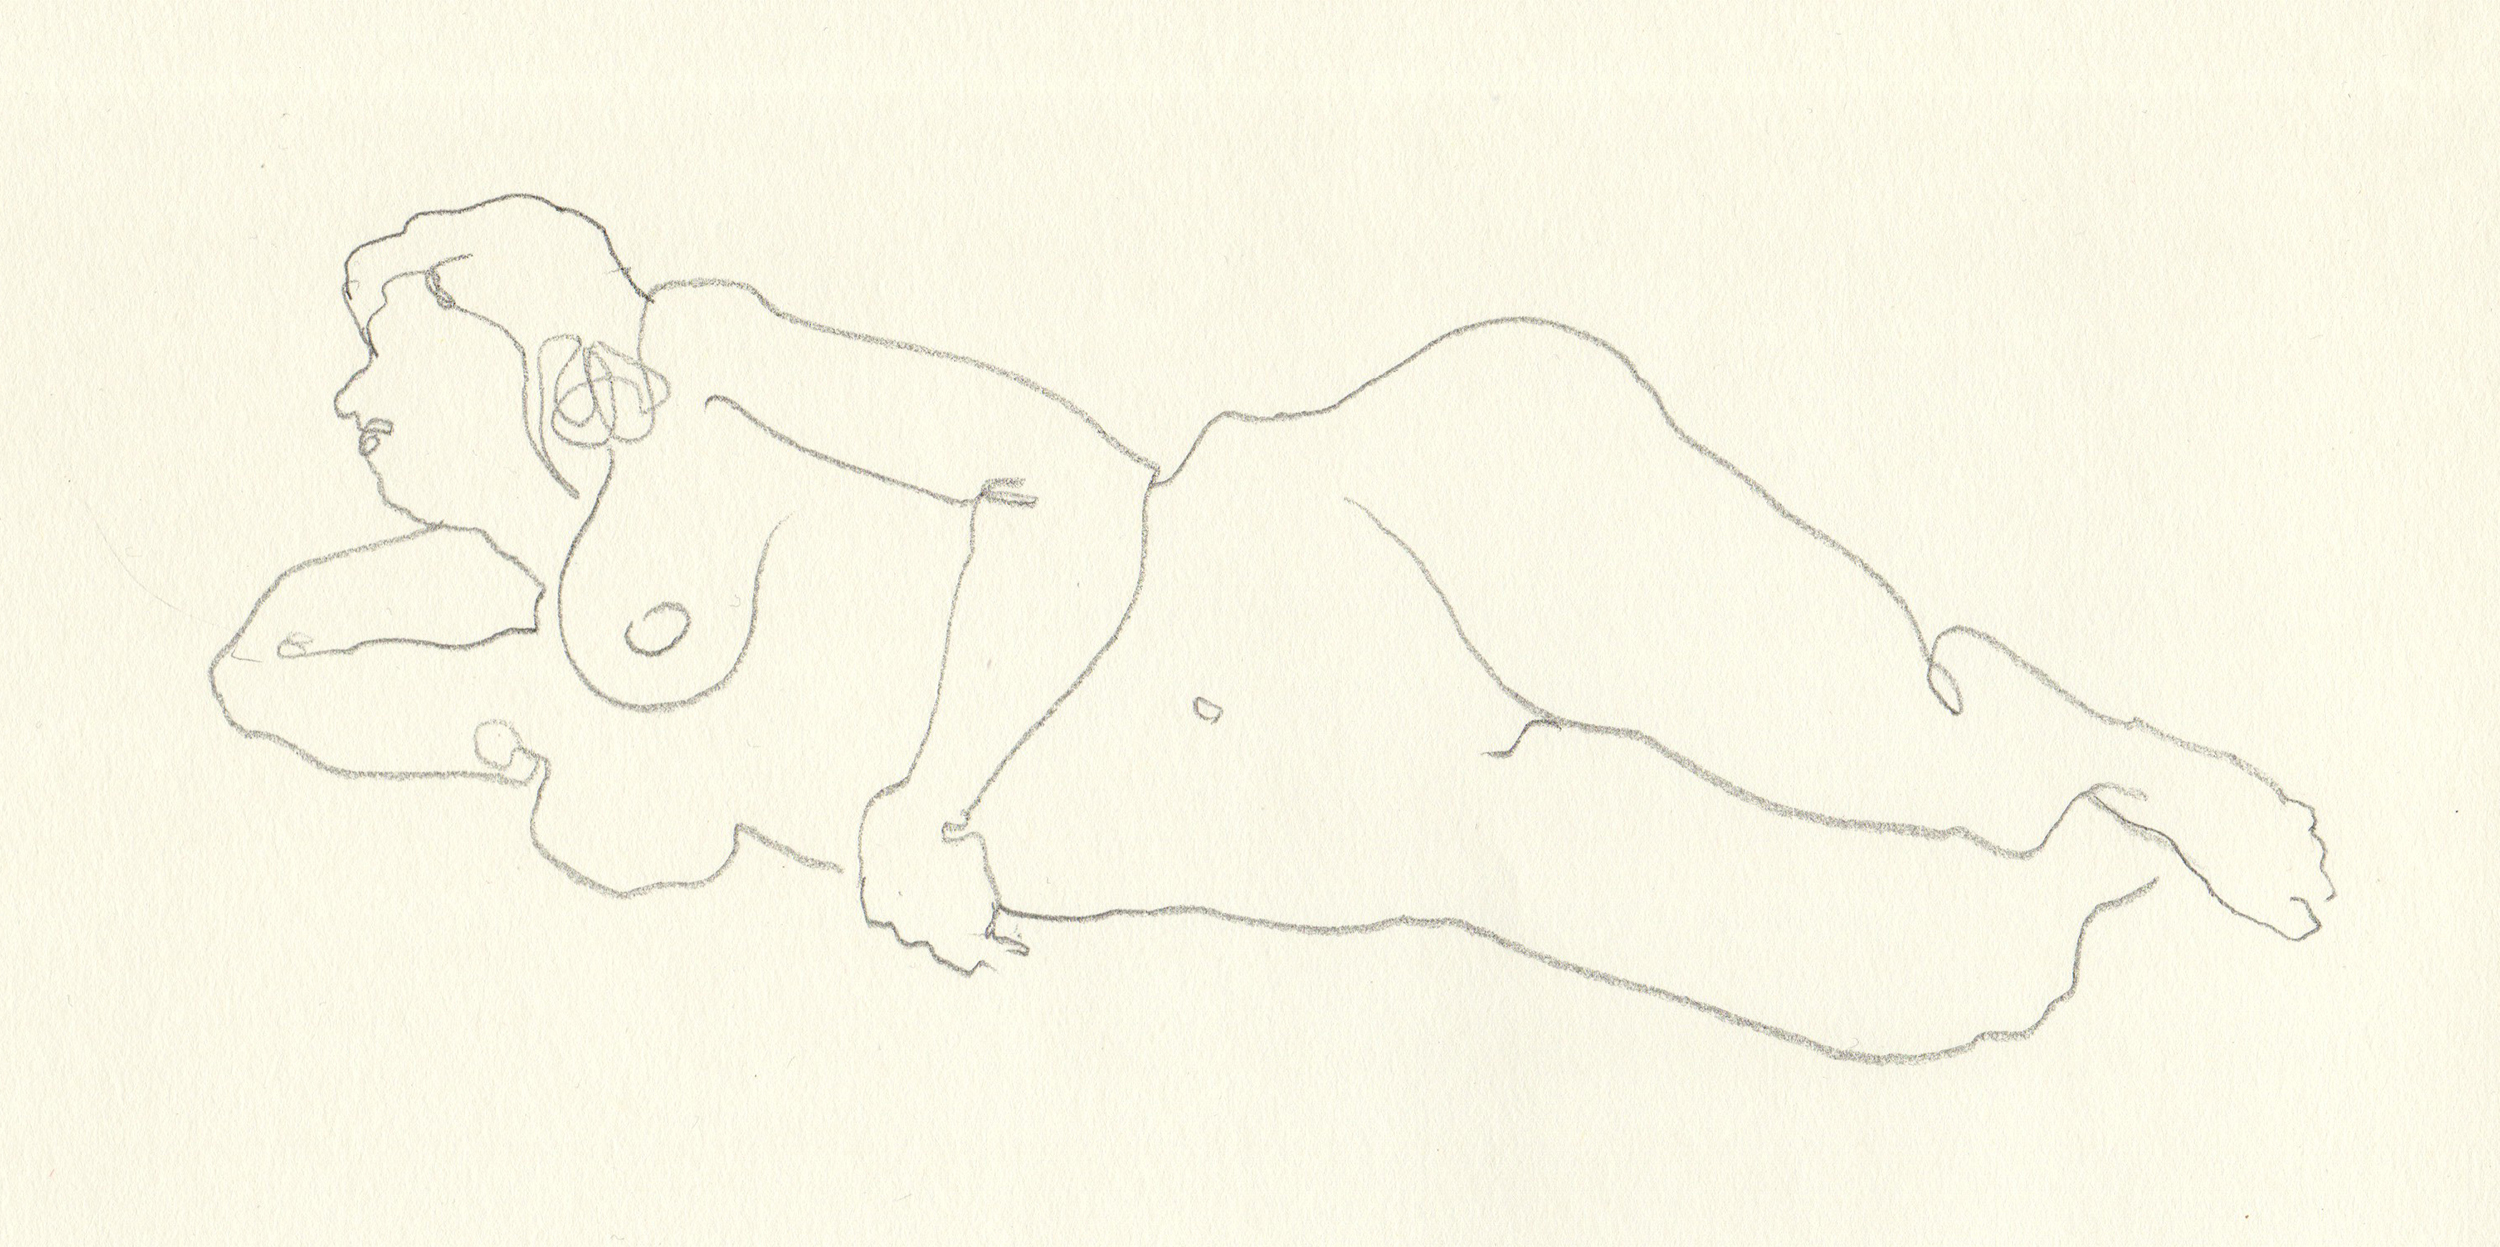 2012_Sketch_F-Beudin_035